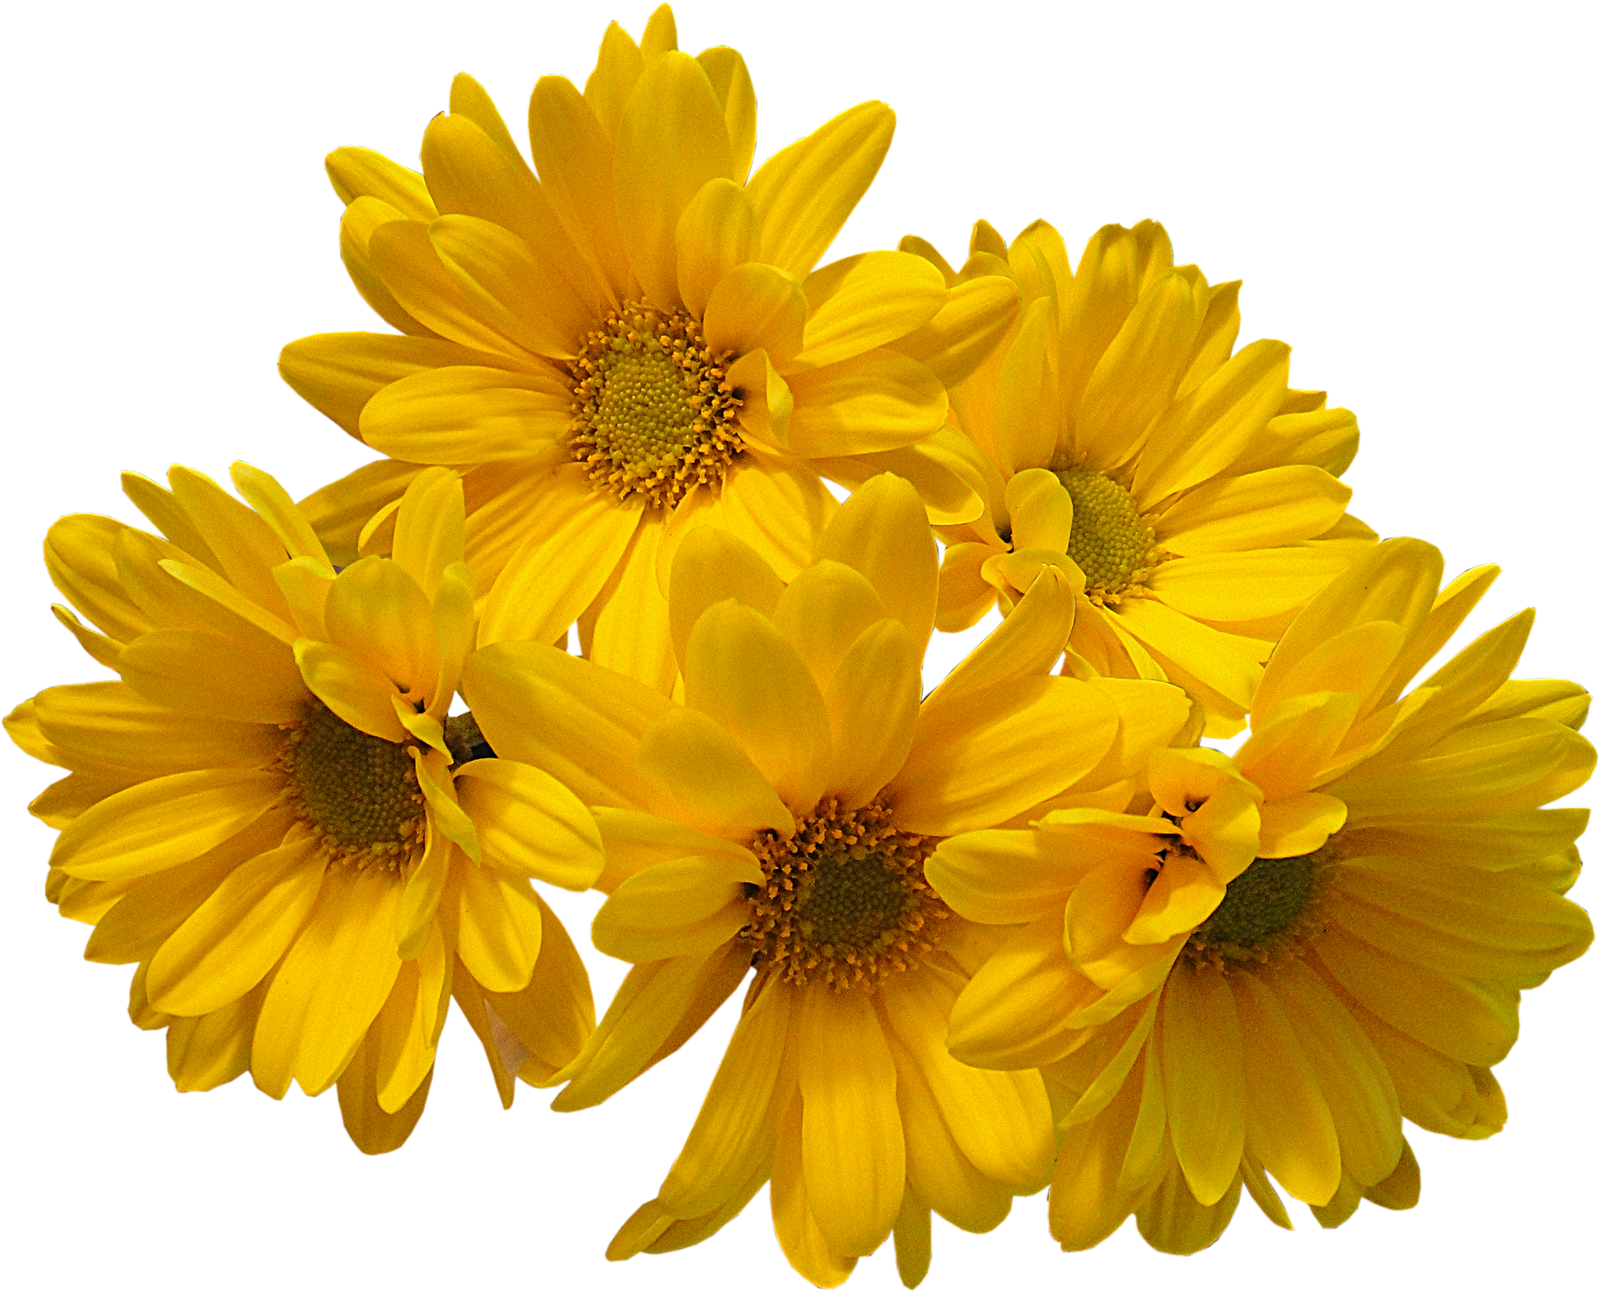 Free photo yellow flowers wood yellow flowers free download download yellow flowers bouquet transparent image hq png image mightylinksfo